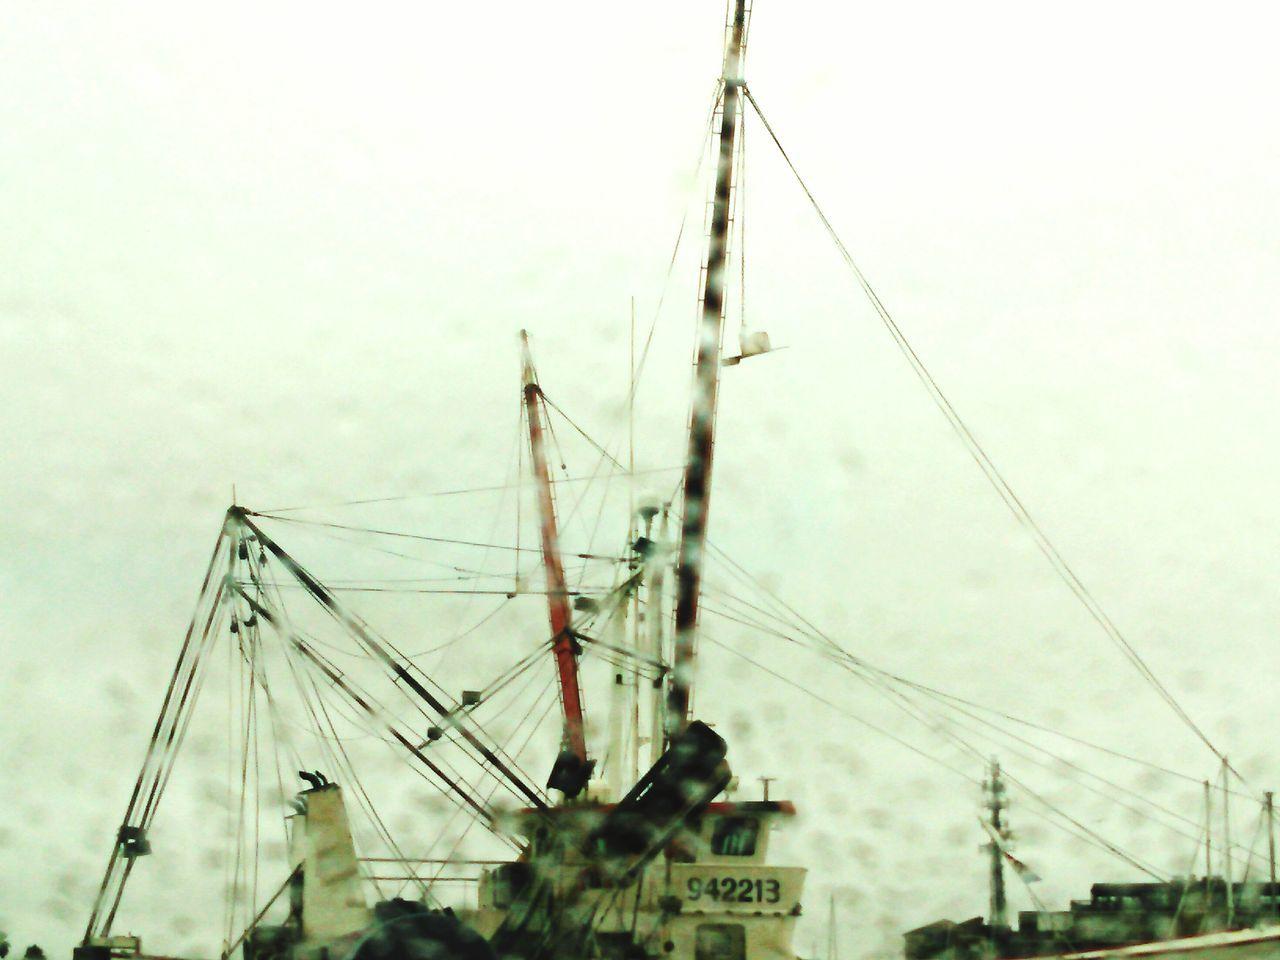 Shrimp Boat Looking Through Window Rain Gulf Of Mexico